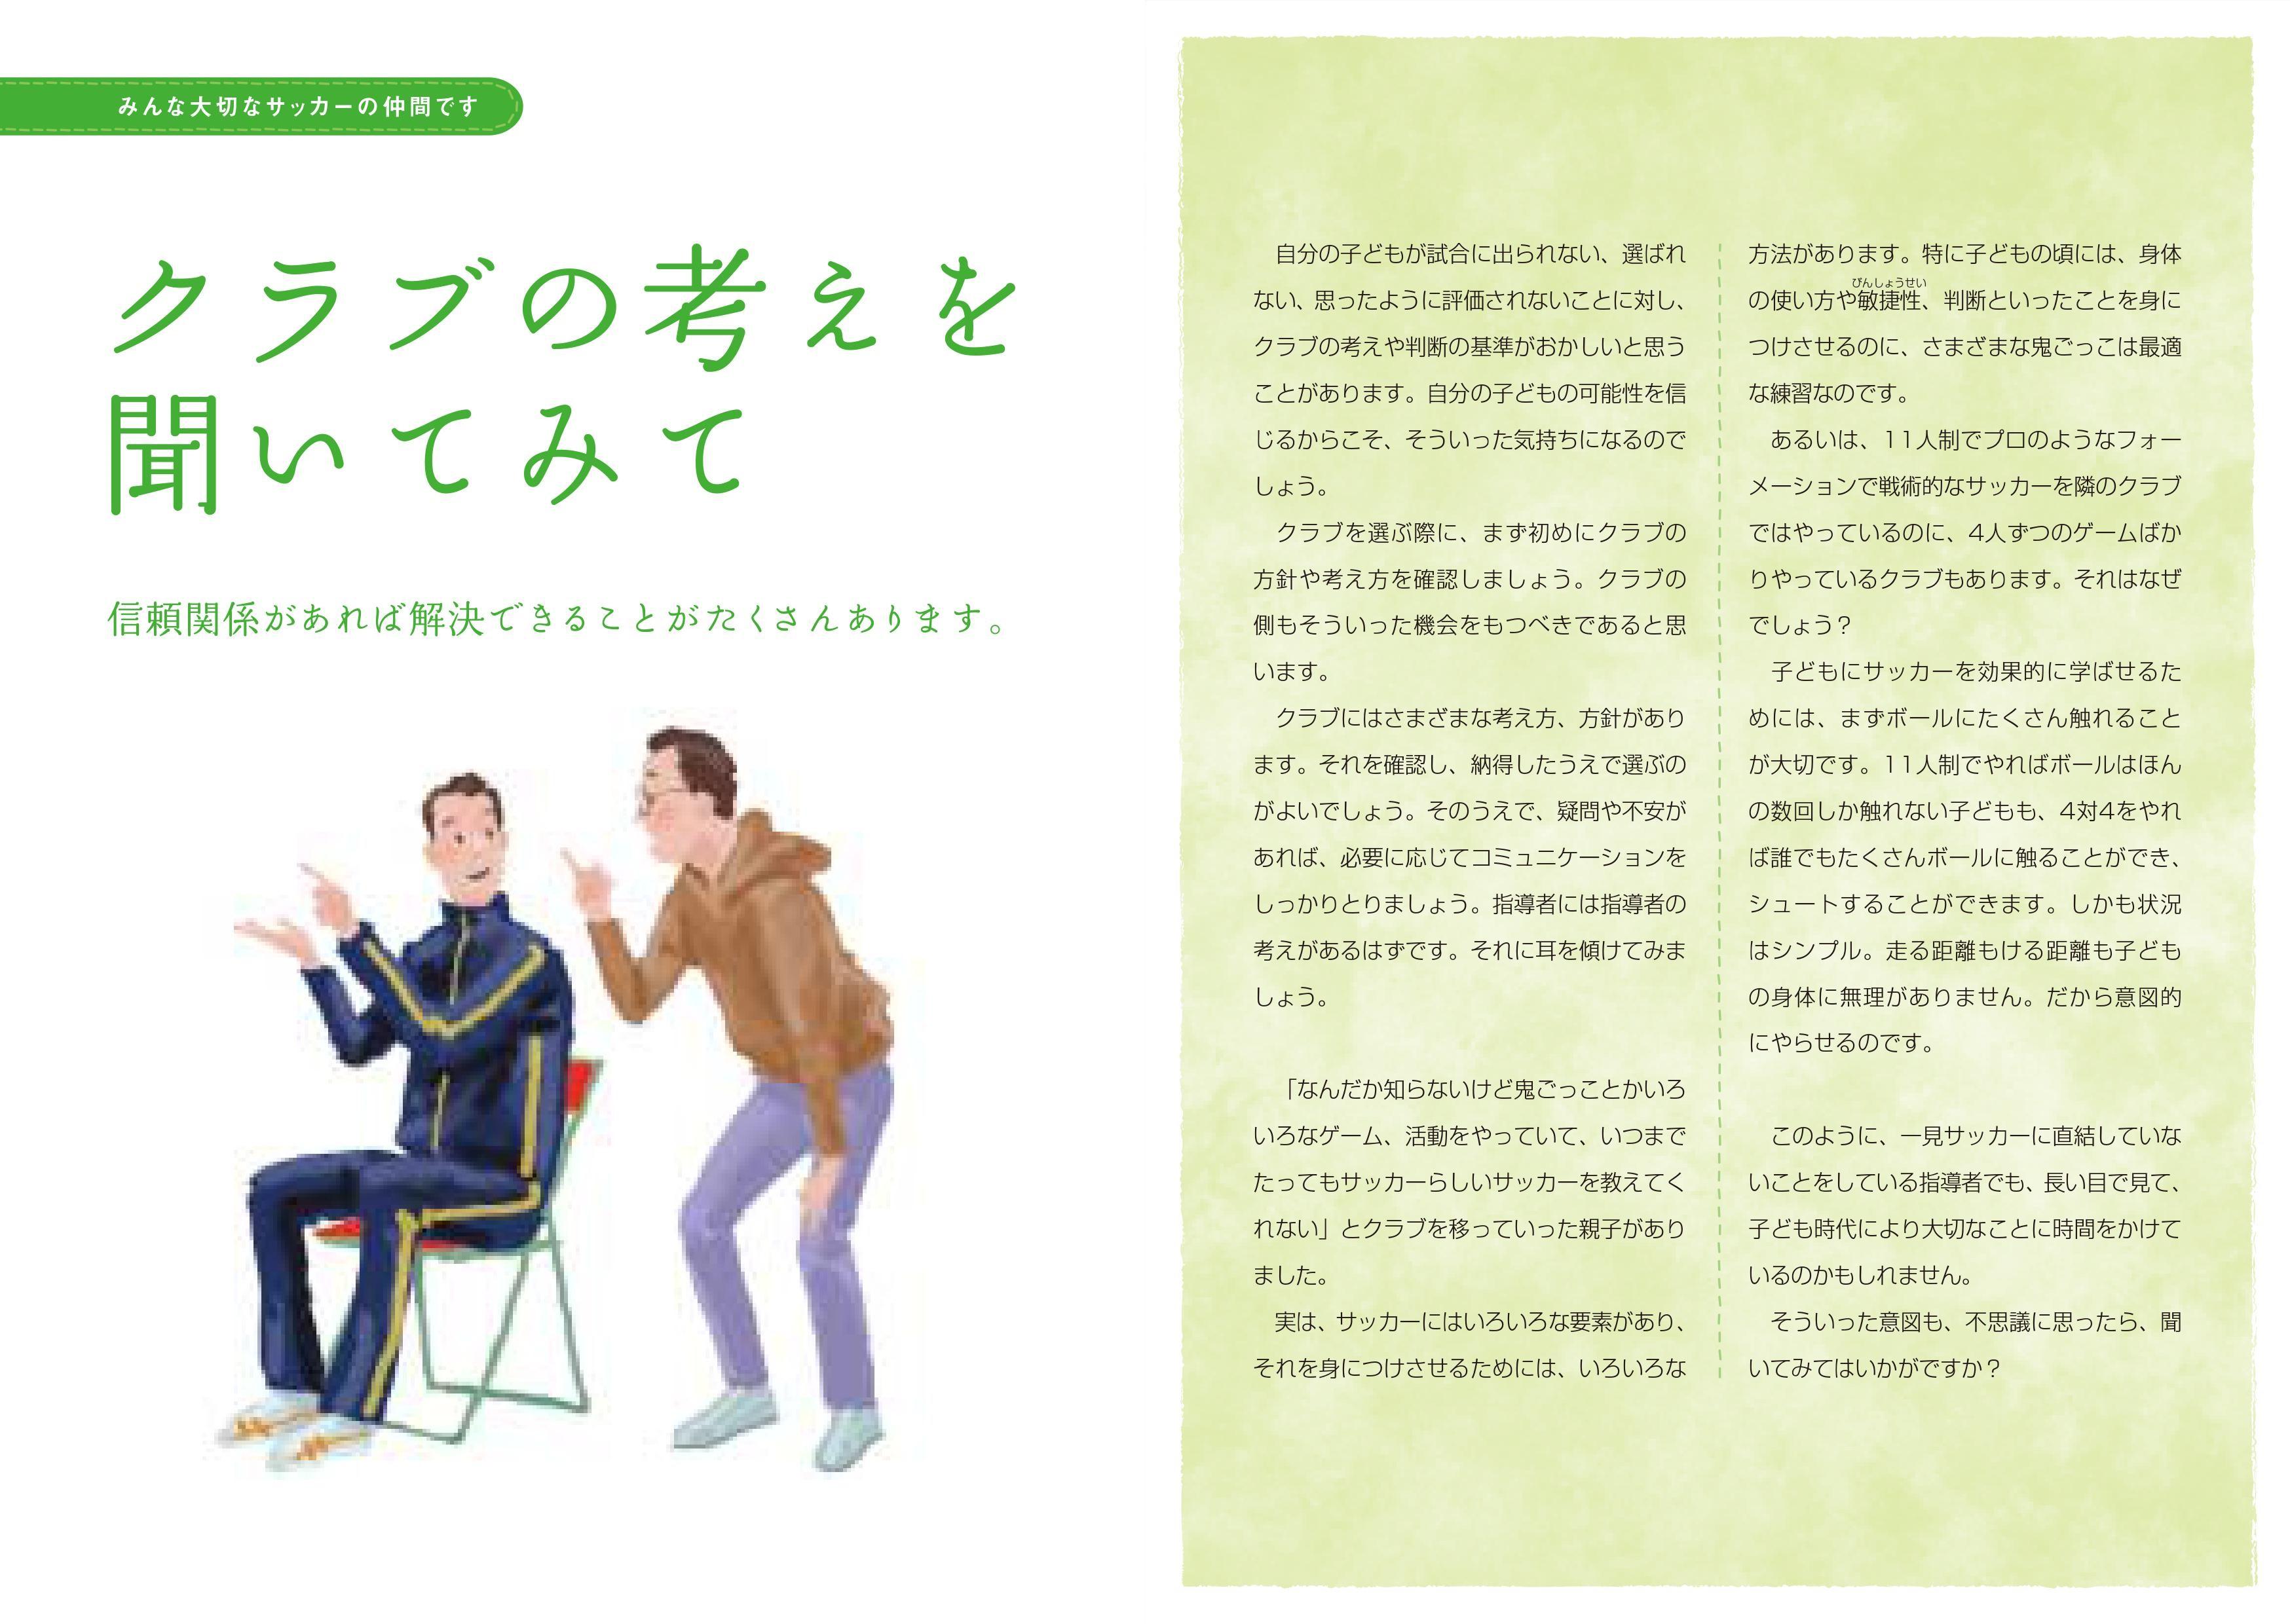 JFA handbook _09